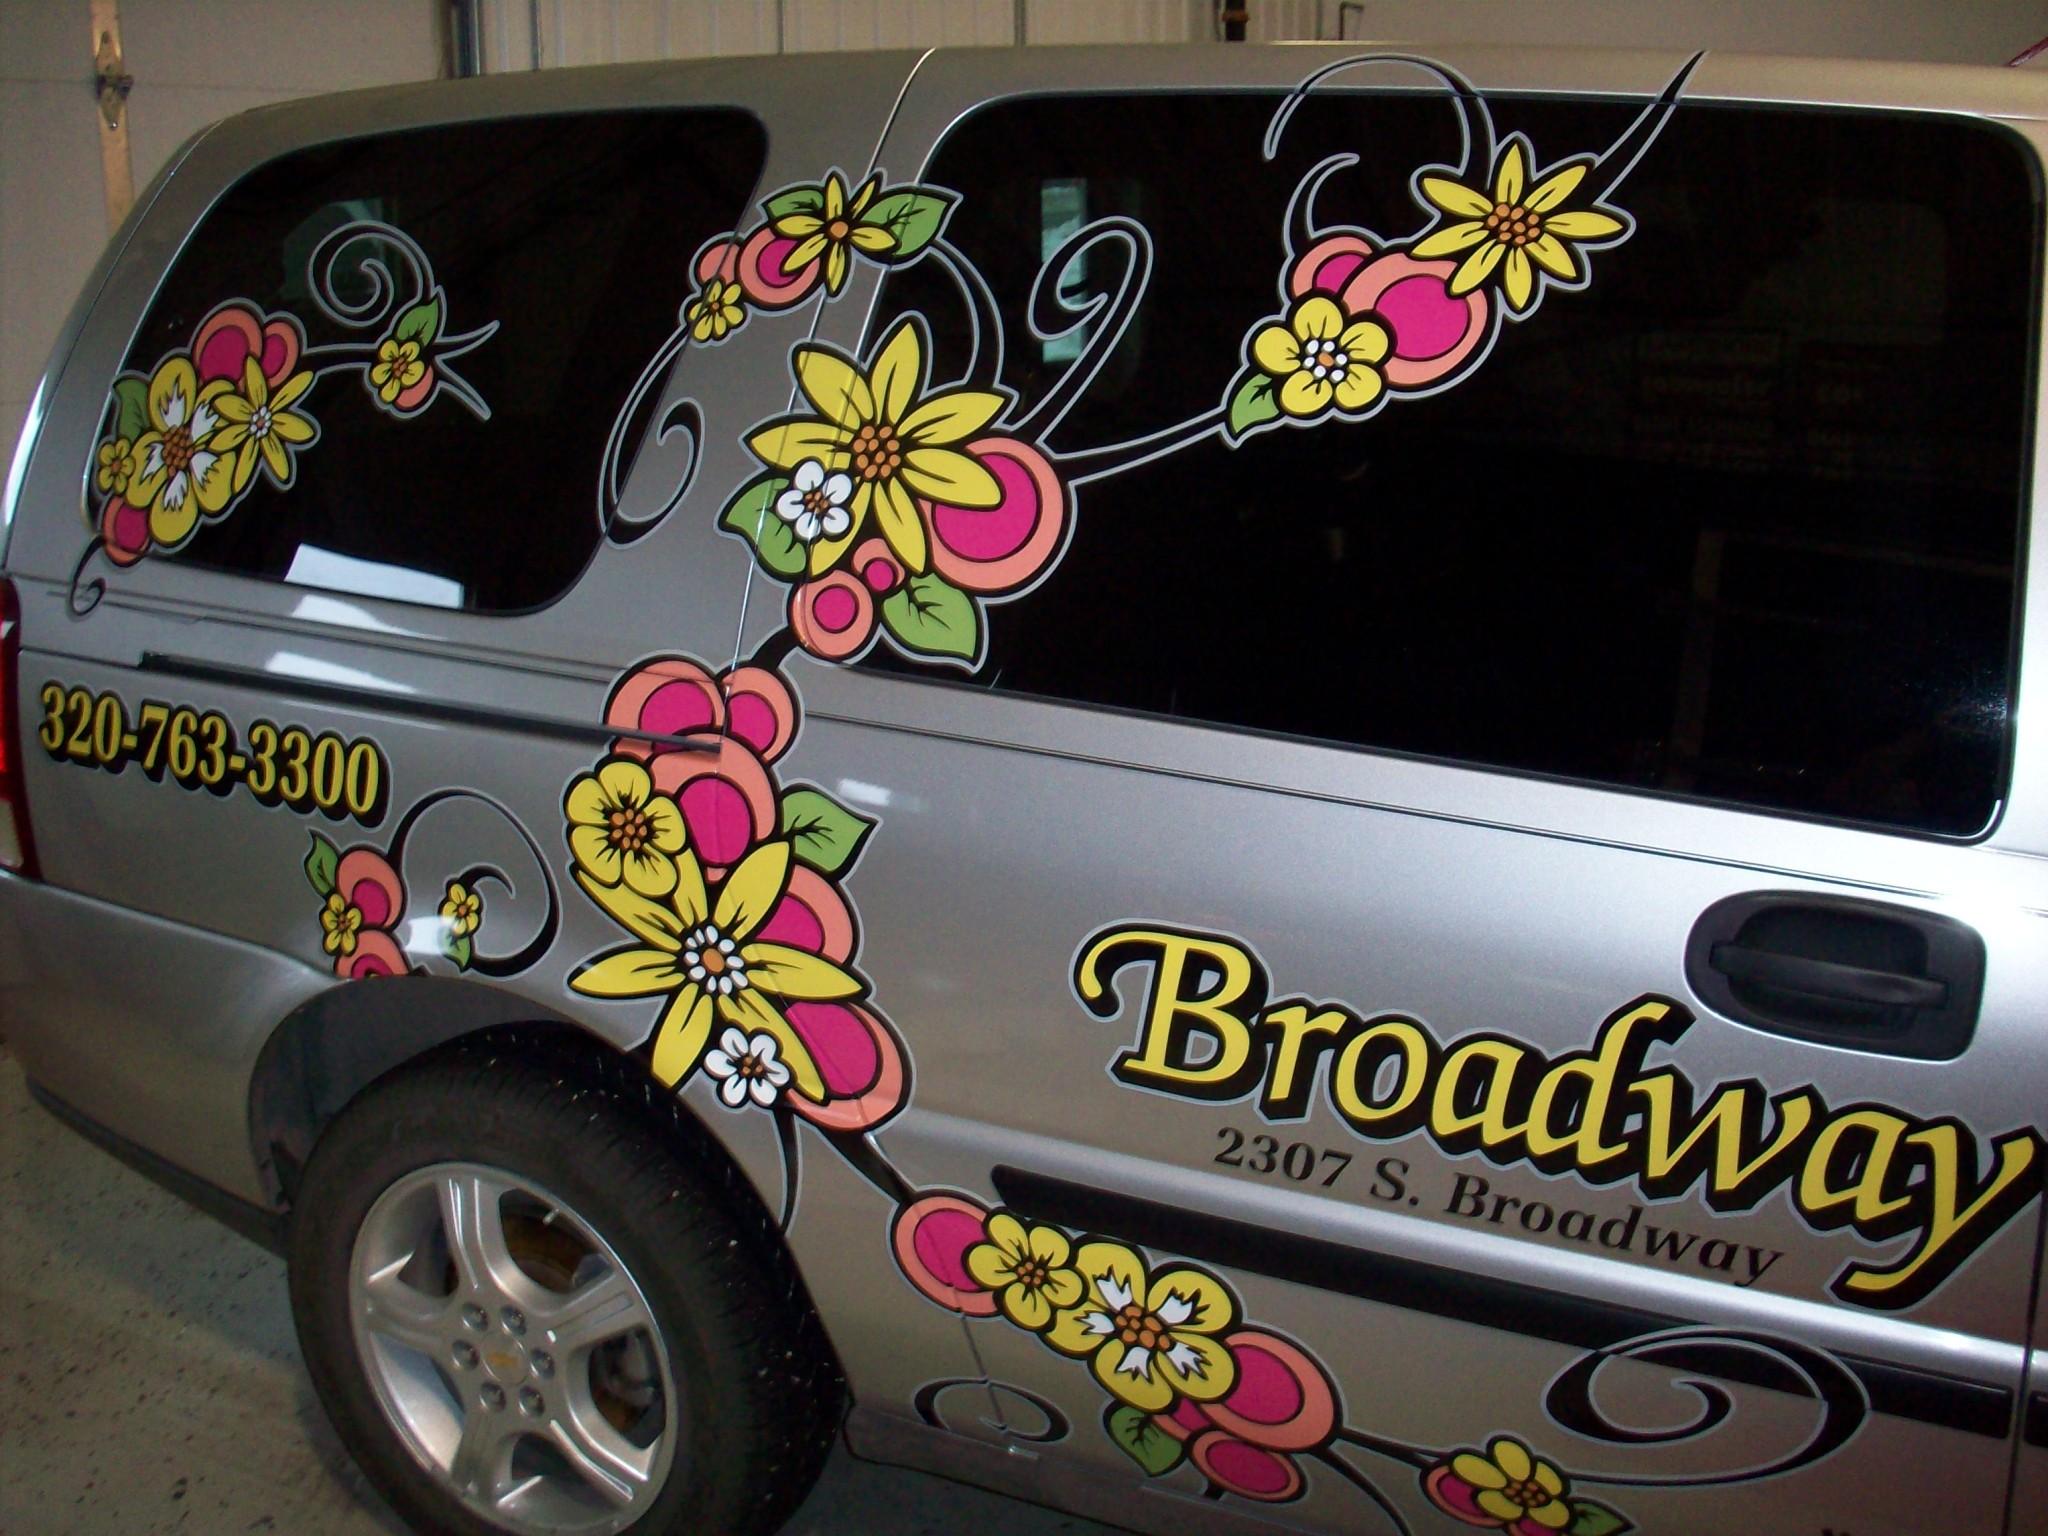 Vehicle Graphics Winning Edge Graphics - Auto graphics for car